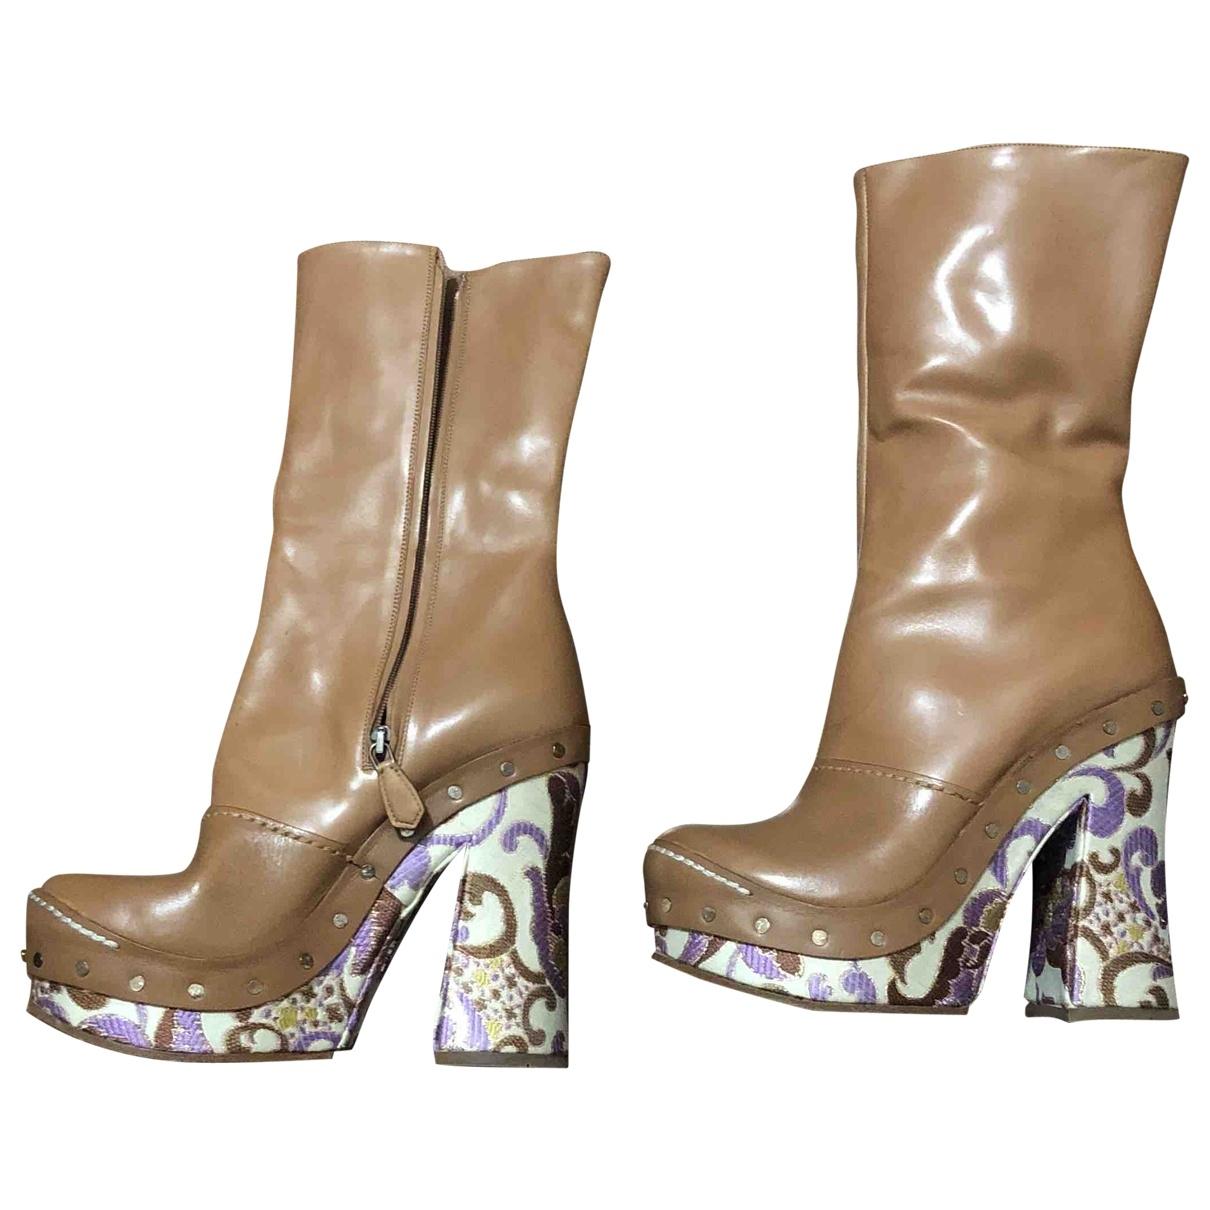 Prada \N Beige Leather Ankle boots for Women 36 EU